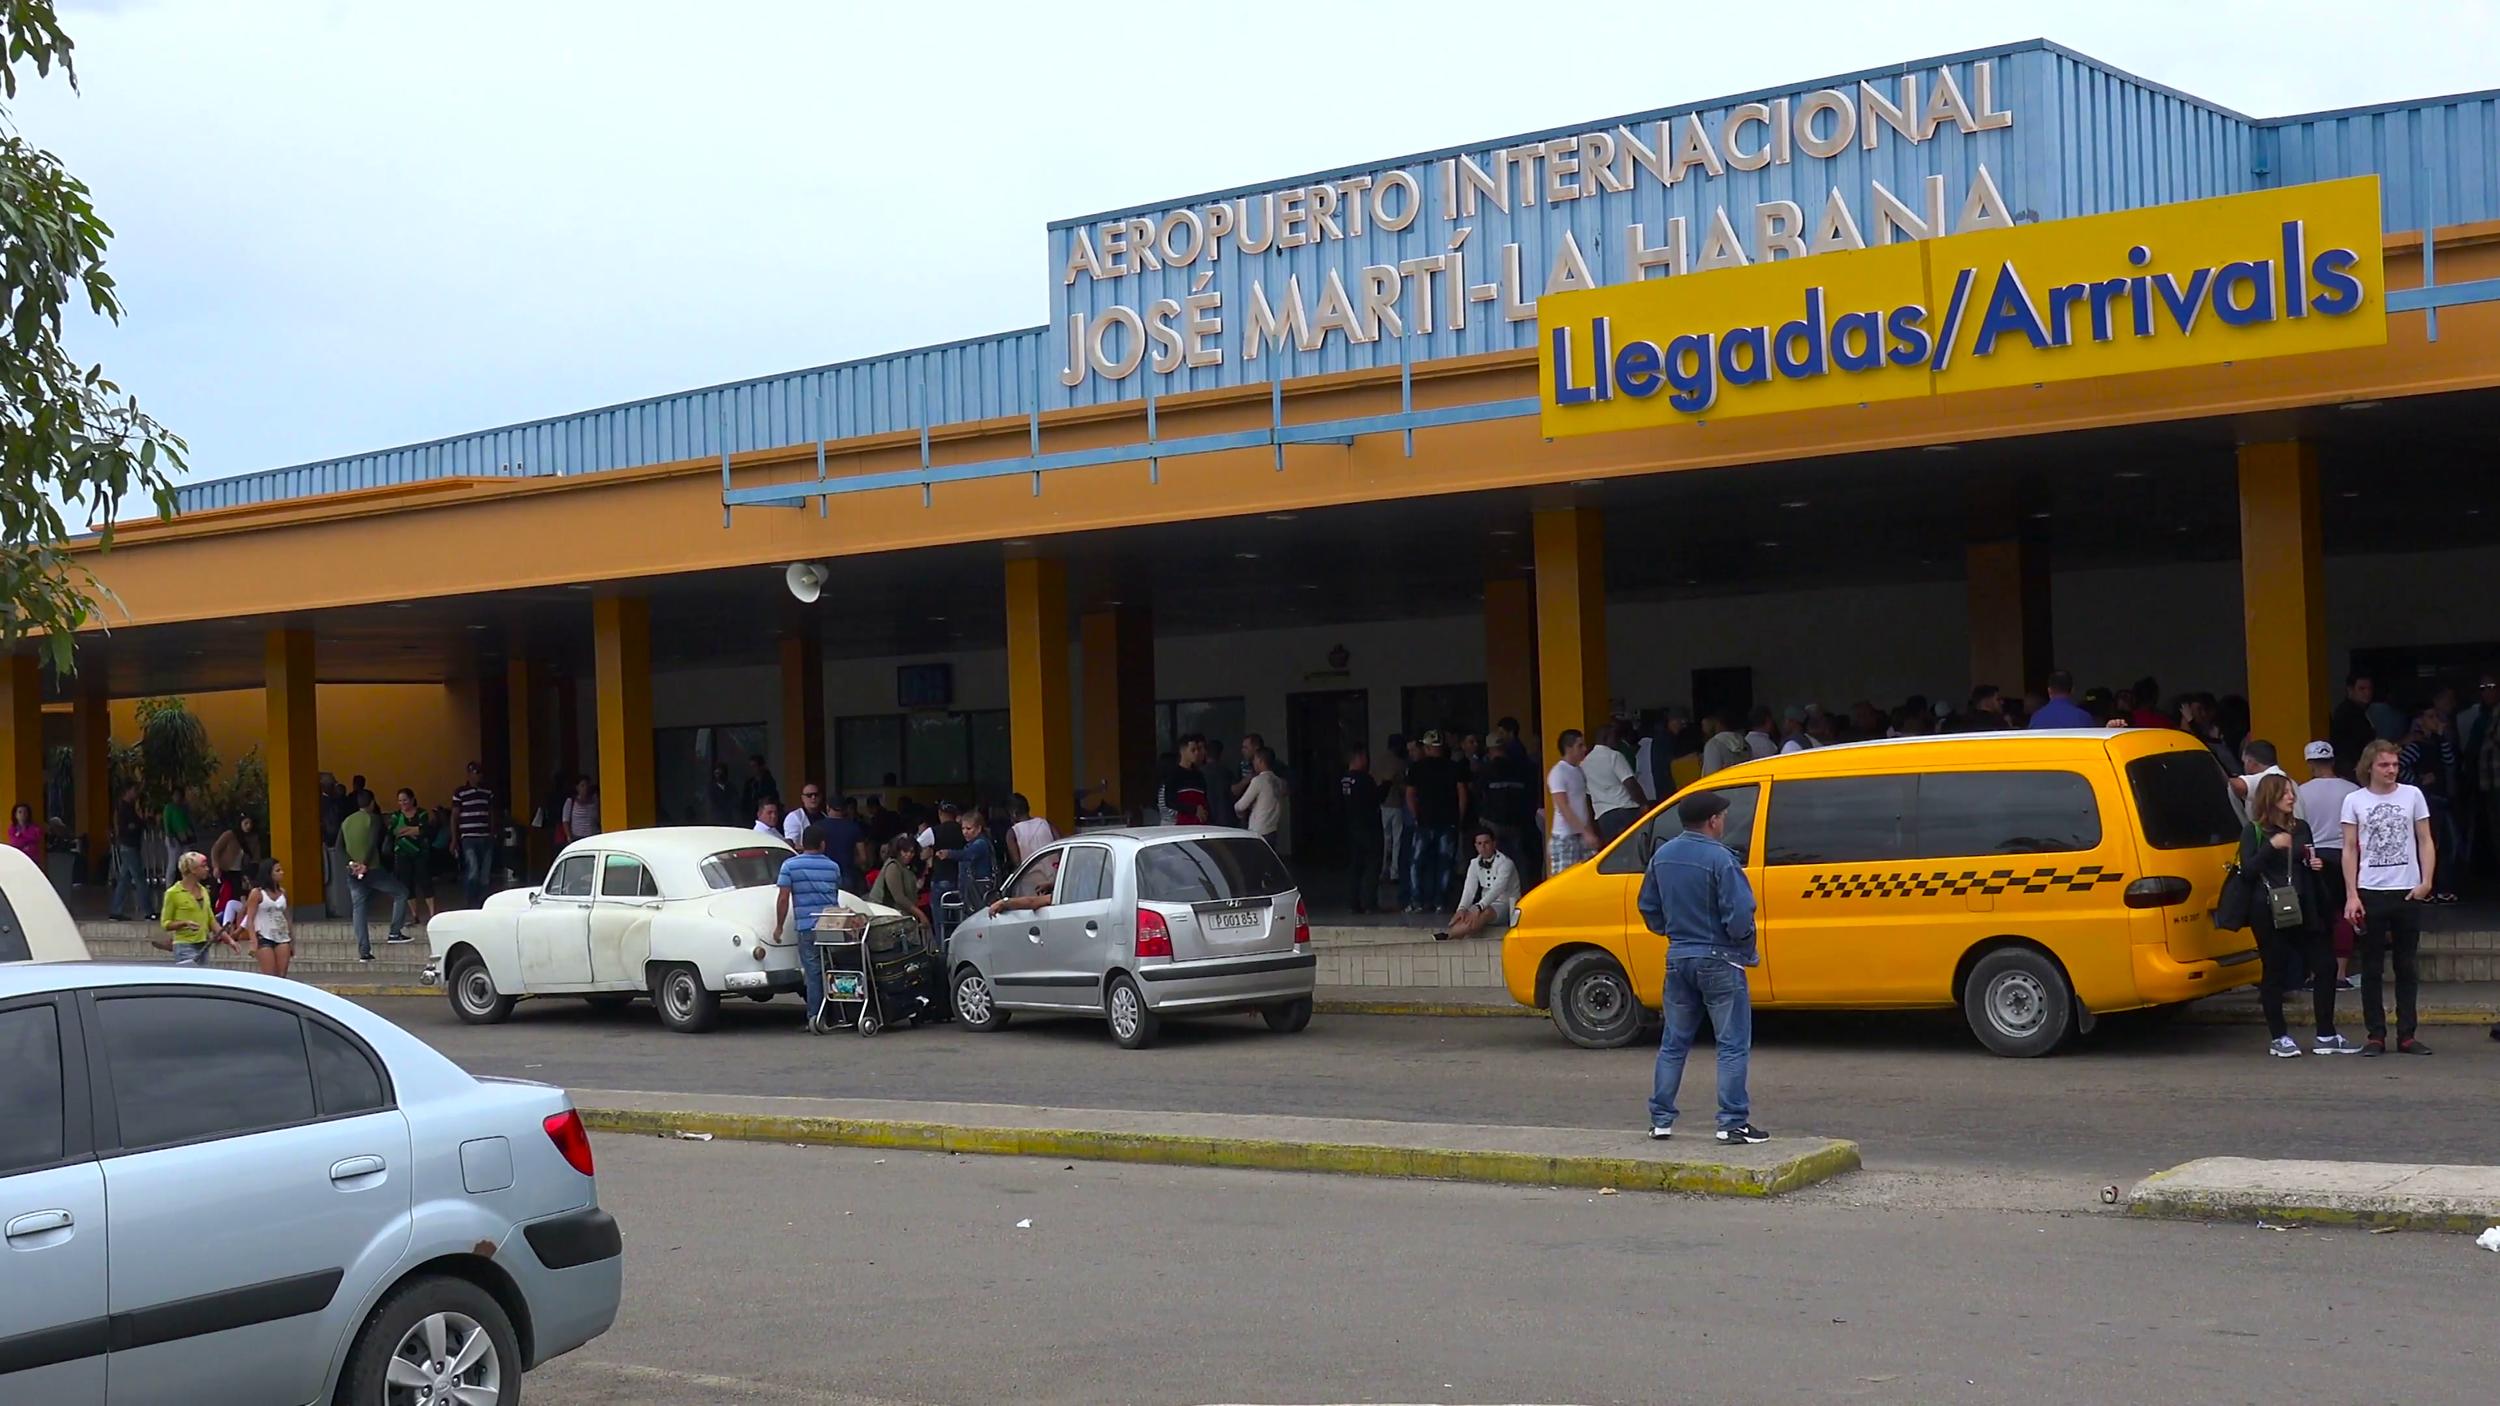 establishing-shot-of-the-jose-marti-international-airport-in-havana-cuba_rsvpelxo__F0000.png